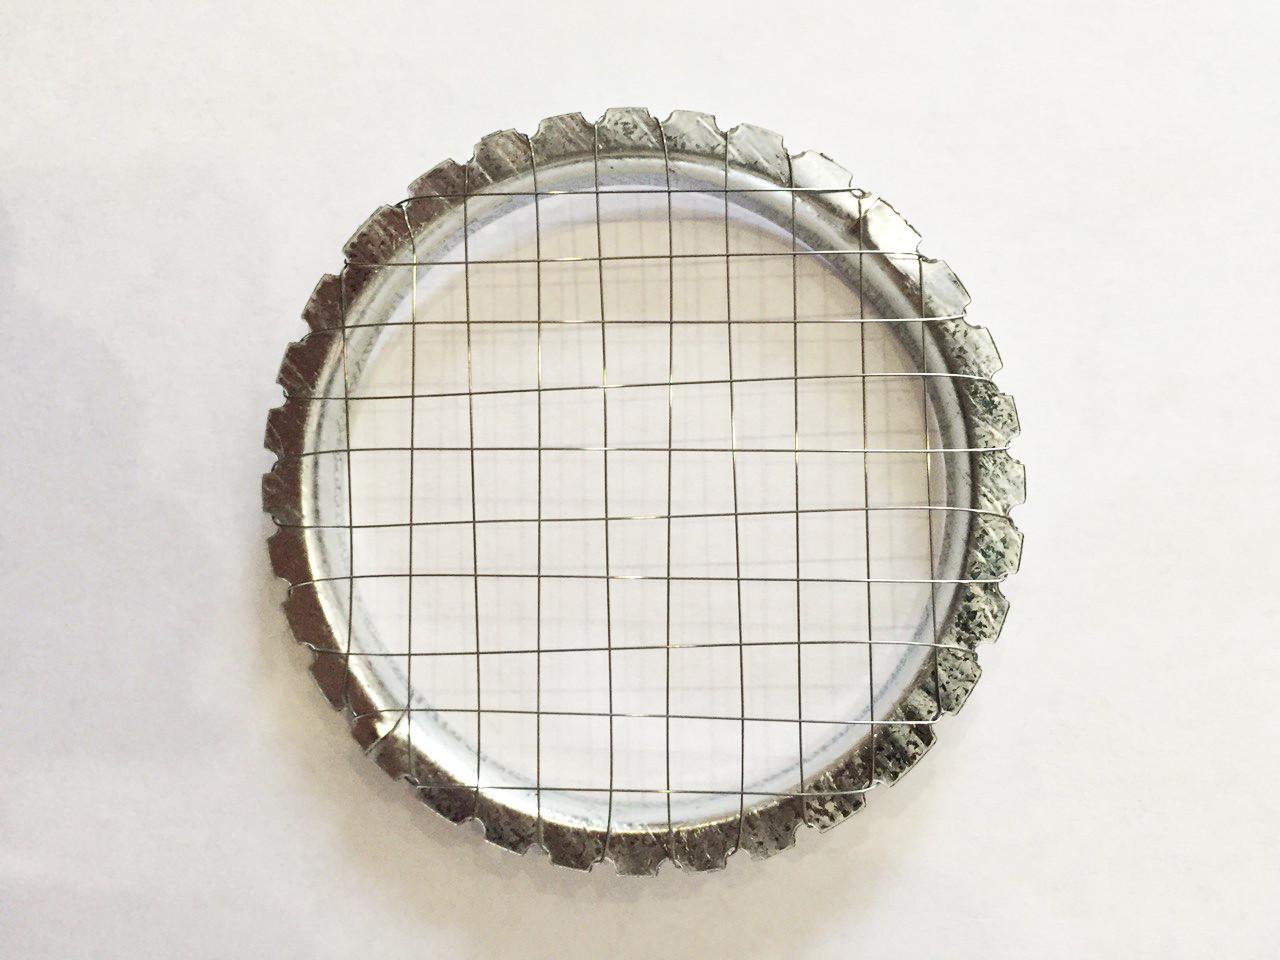 Овощерезка-яйцерезка сеточка (металл)